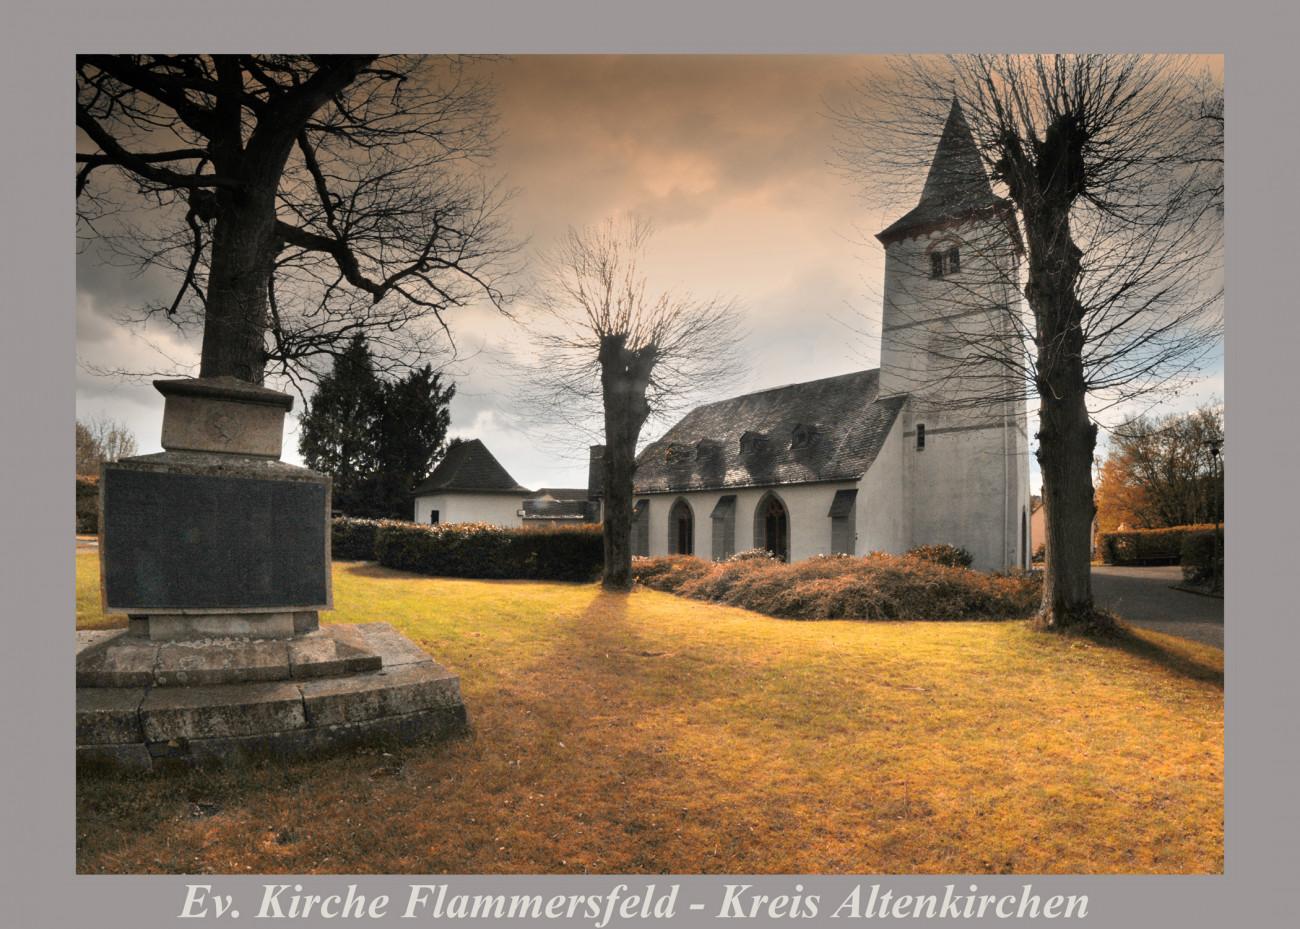 Gerd Asmussen Photograph, Evangelische Kirchen im Kreis Altenkirchen Gerd Asmussen